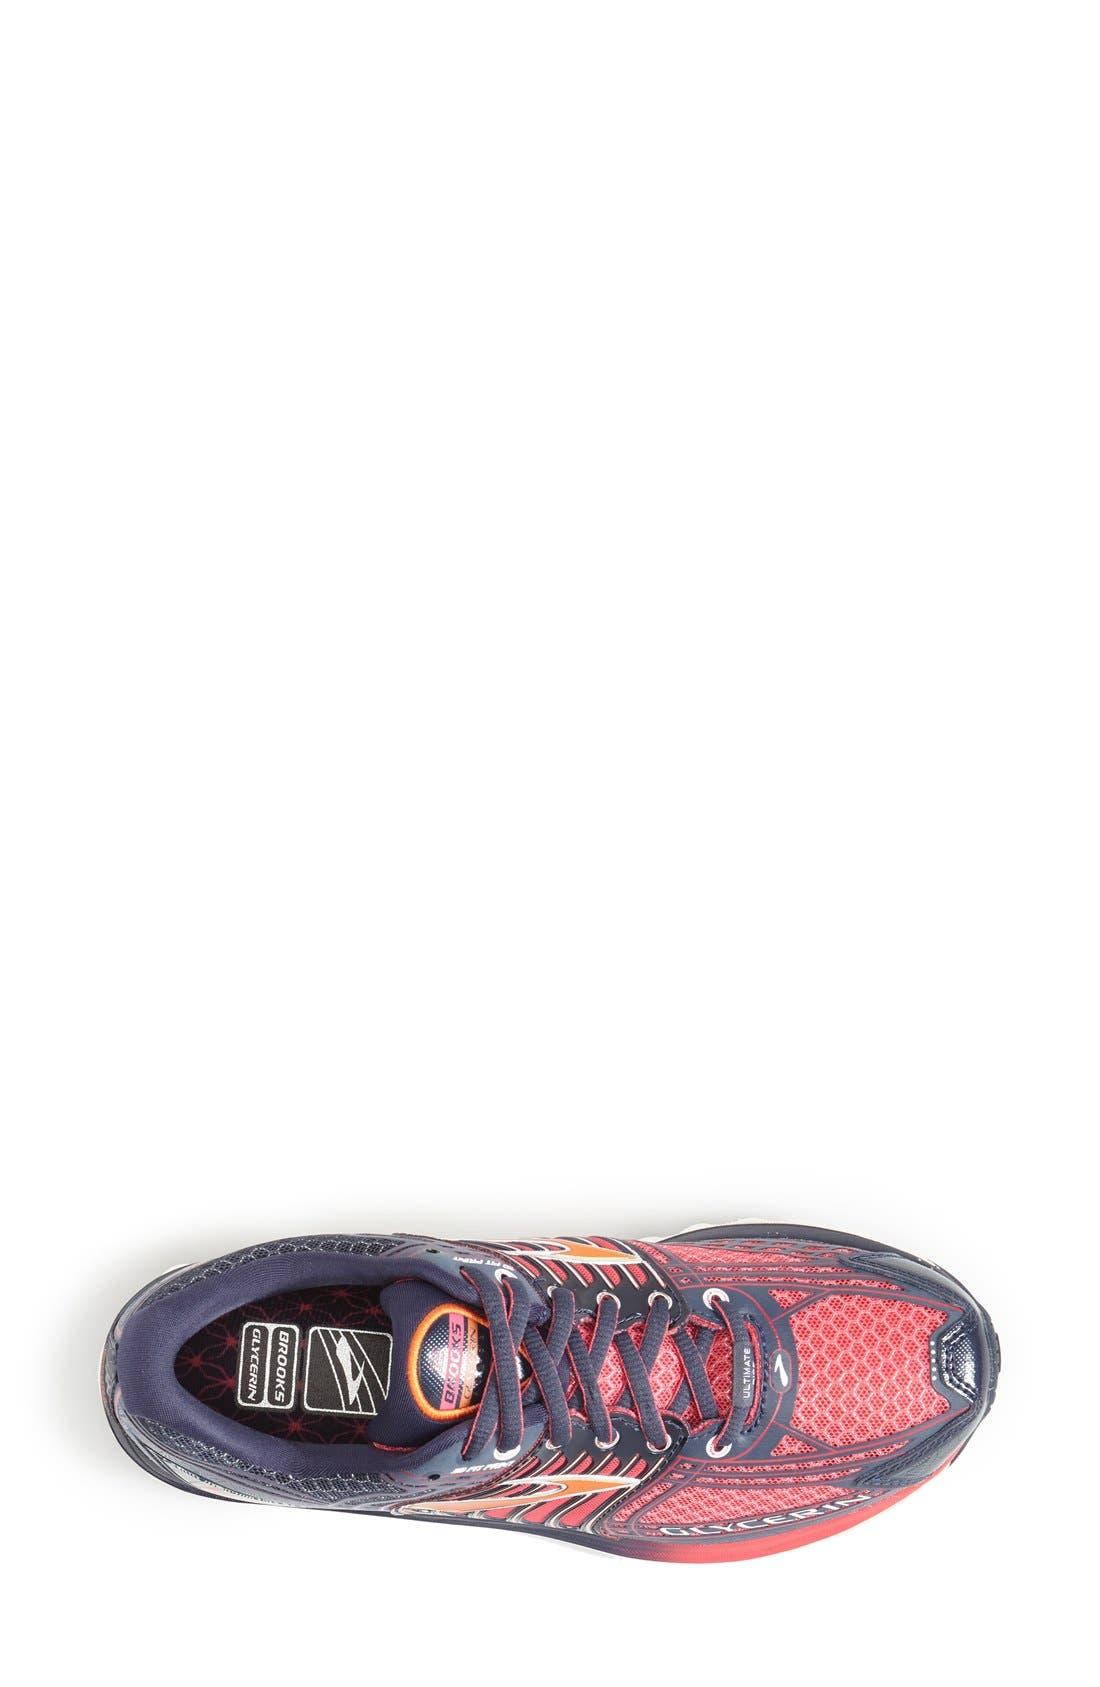 Alternate Image 3  - Brooks 'Glycerin 12' Running Shoe (Women)